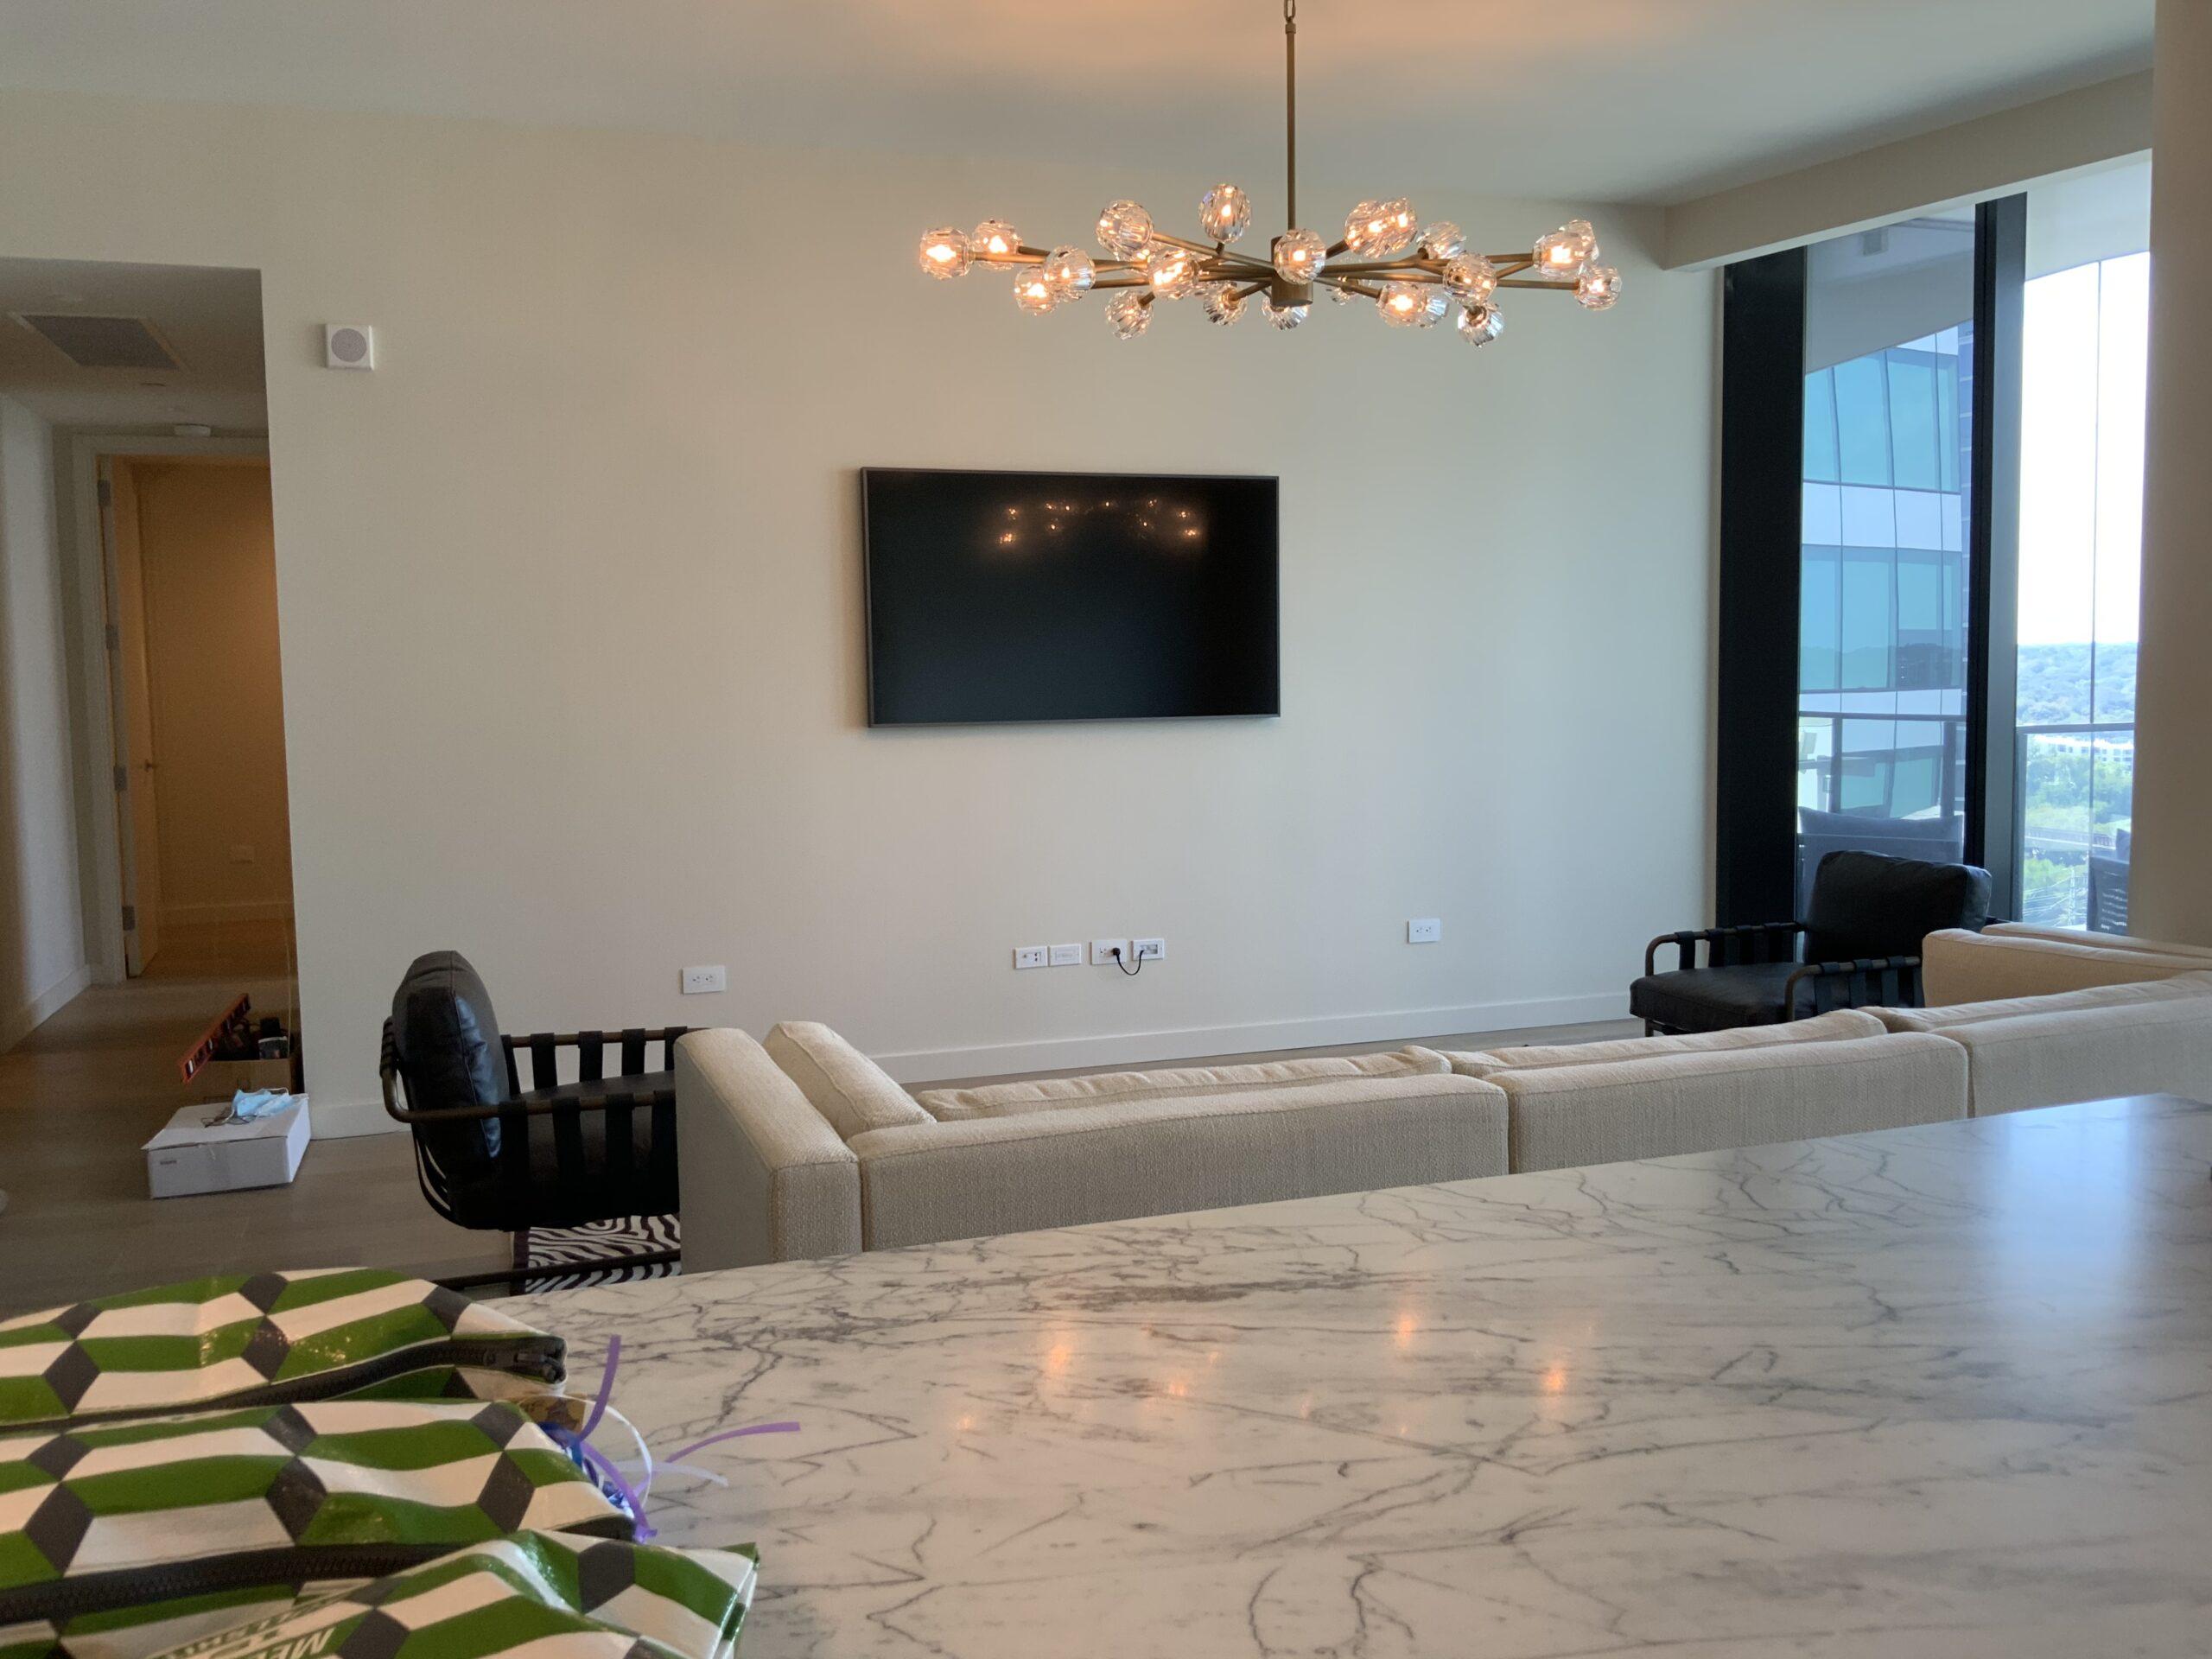 Flat screen mounted TV install